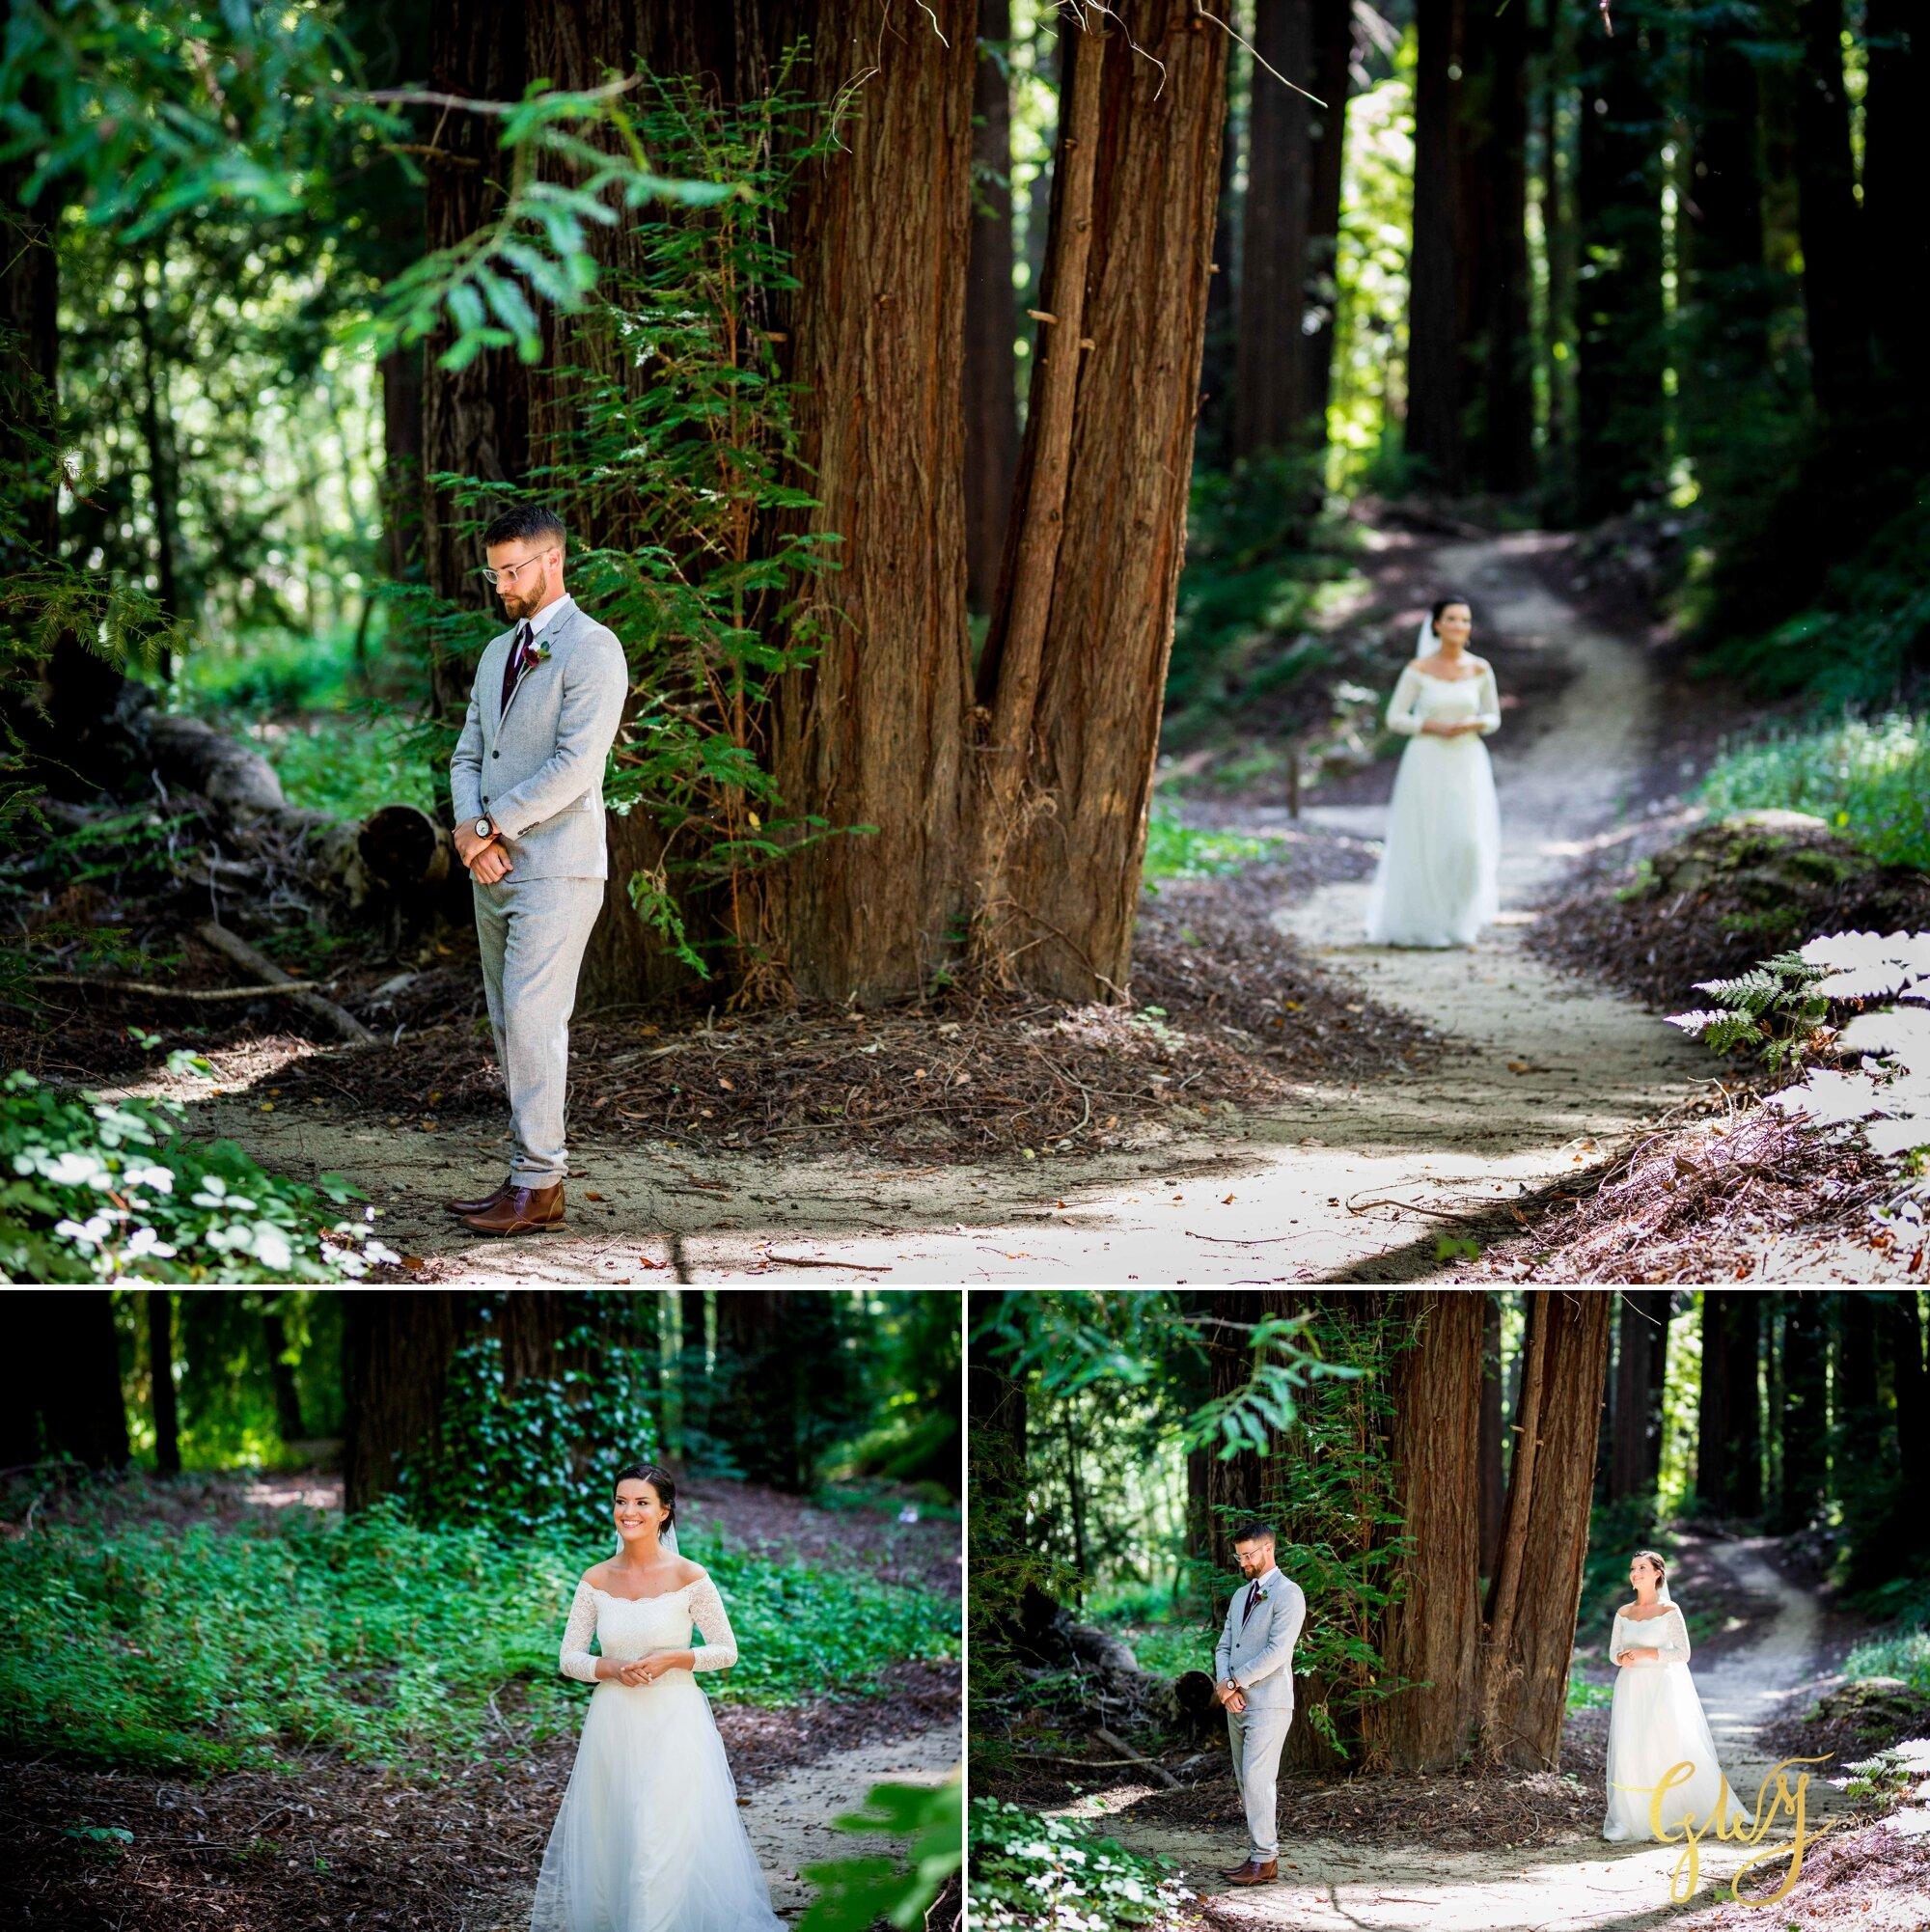 Casey + Jordan's Intimate Big Sur Elopement in the Redwoods by Glass Woods Media 17.jpg